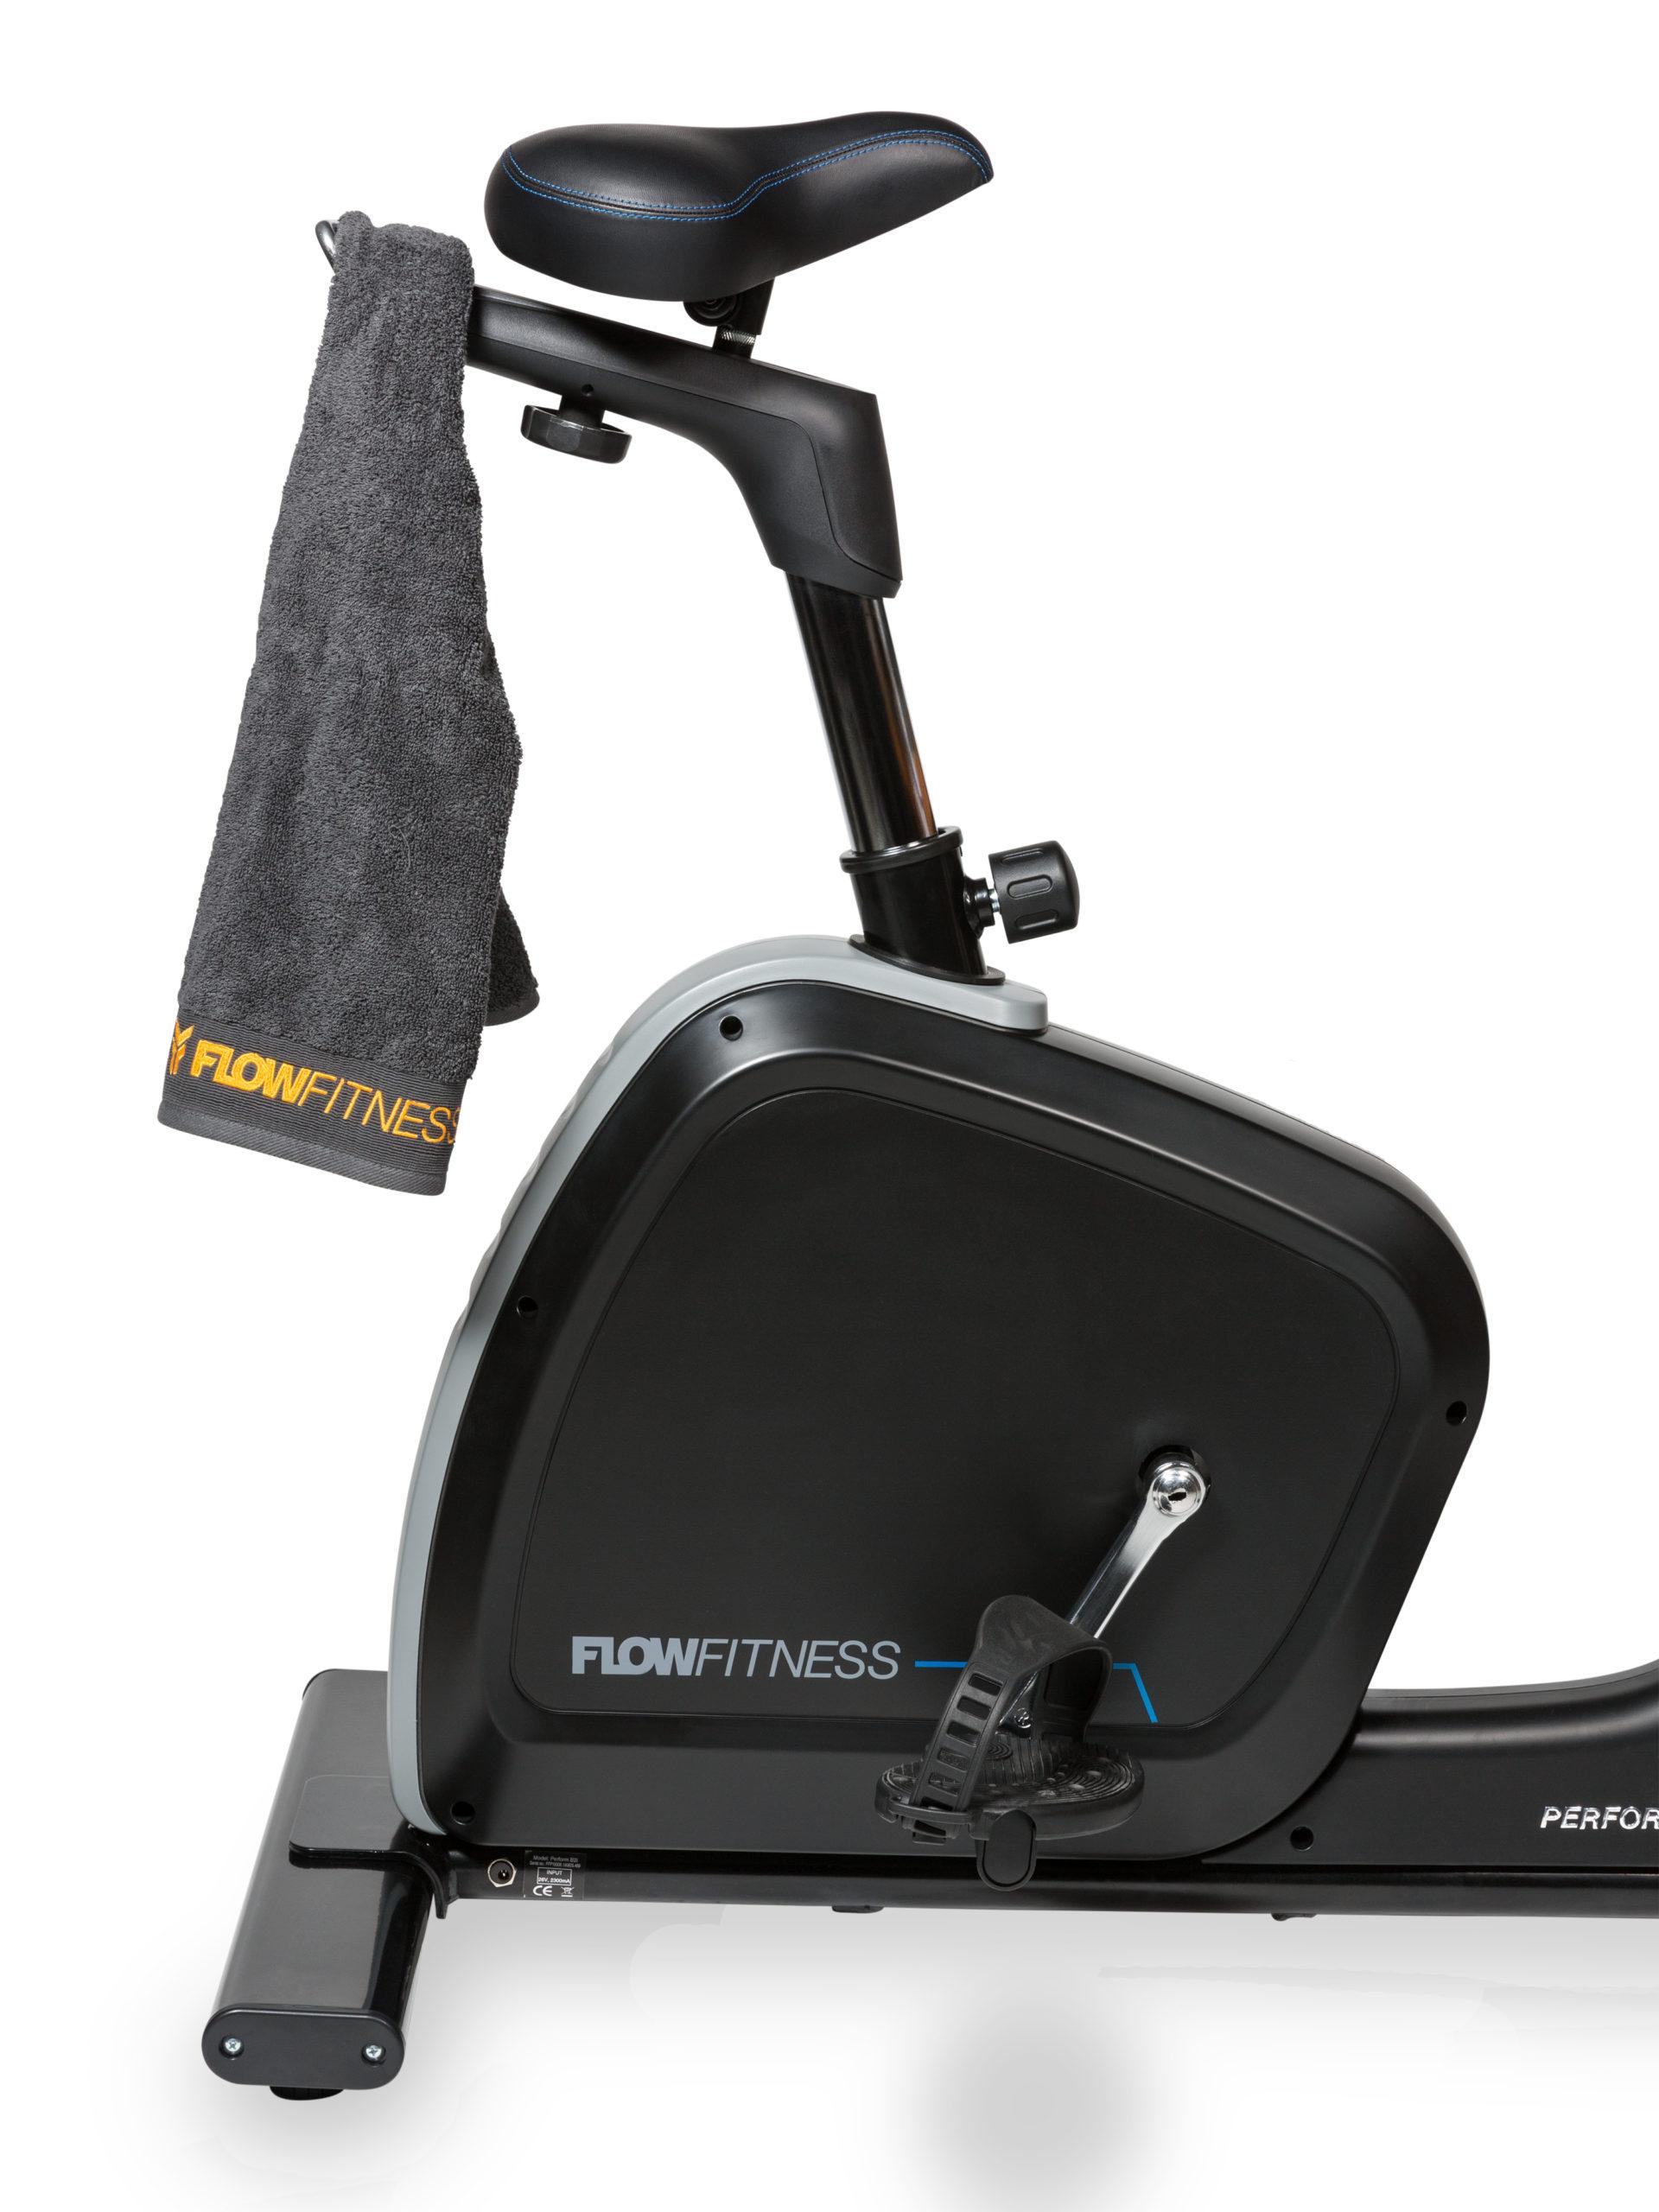 Flow Fitness Tabel PERFORM B2i Ergometer 10